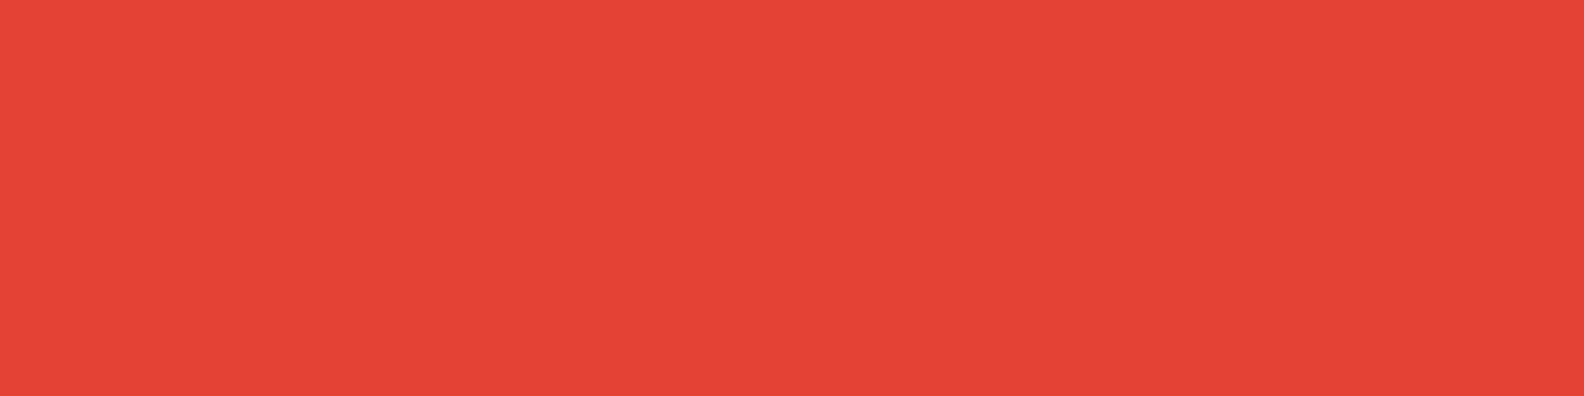 1584x396 Vermilion Cinnabar Solid Color Background